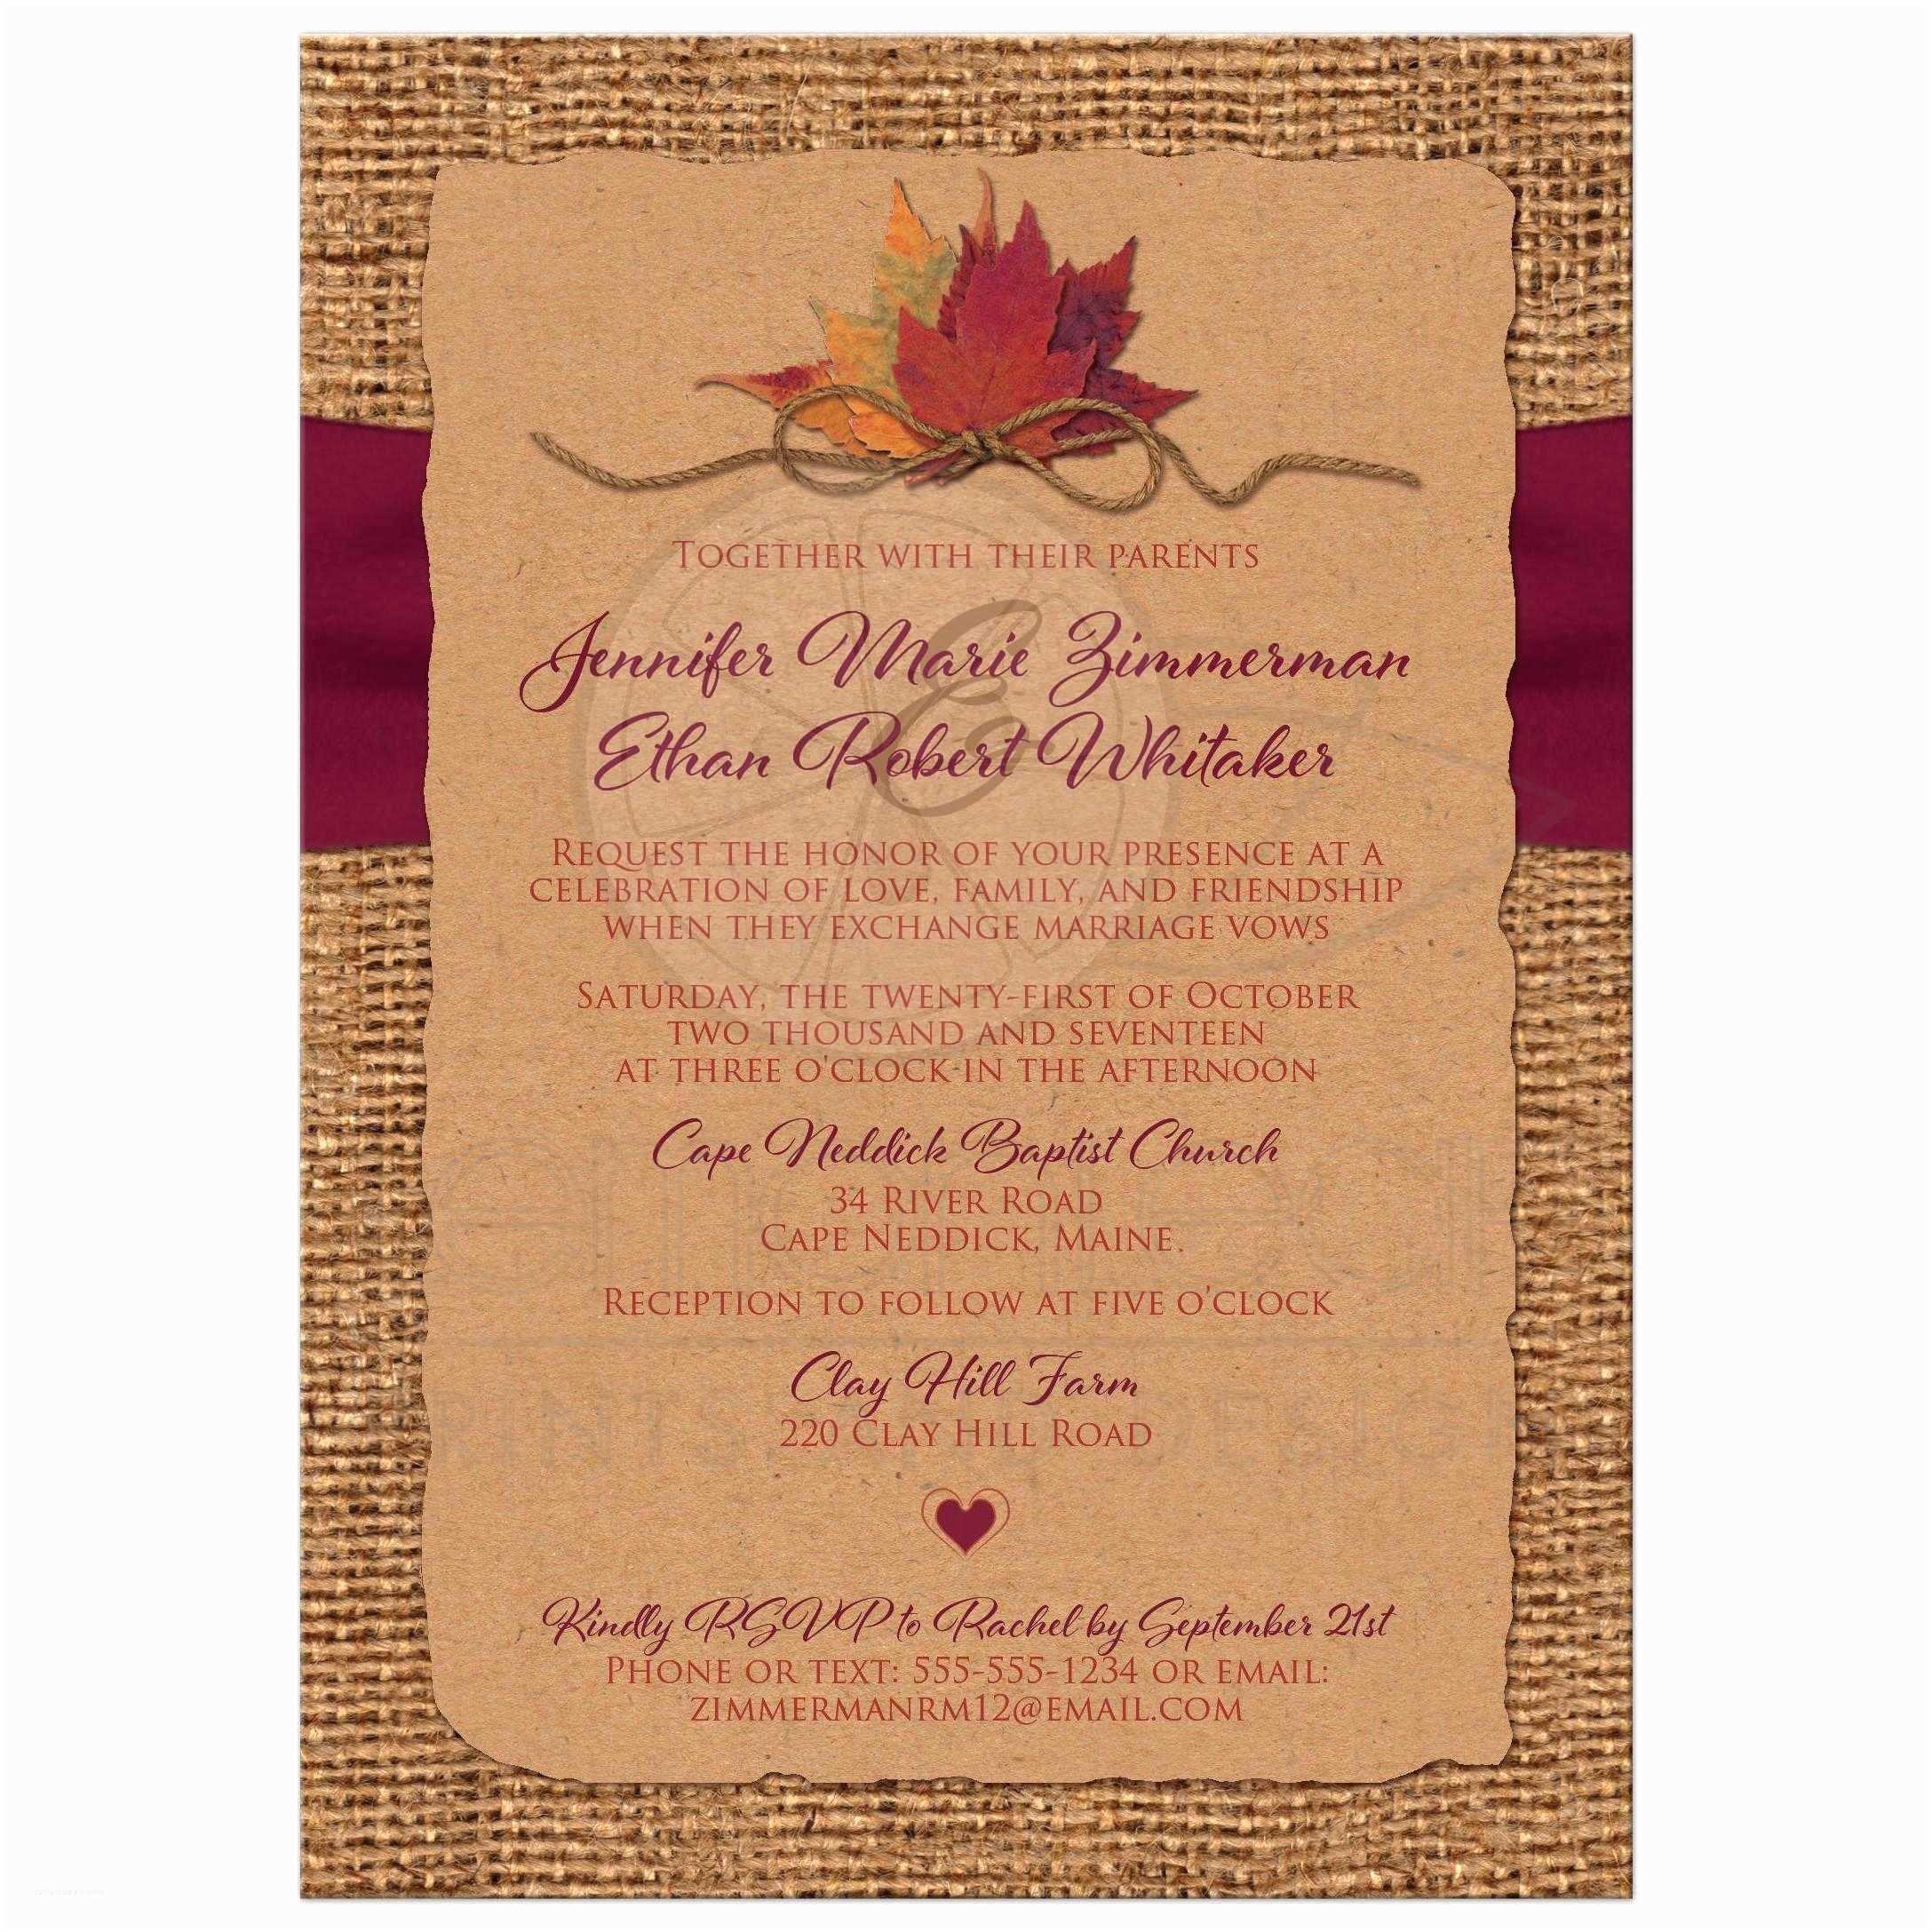 Burgundy themed Wedding Invitations Fall In Love Wedding Invitation